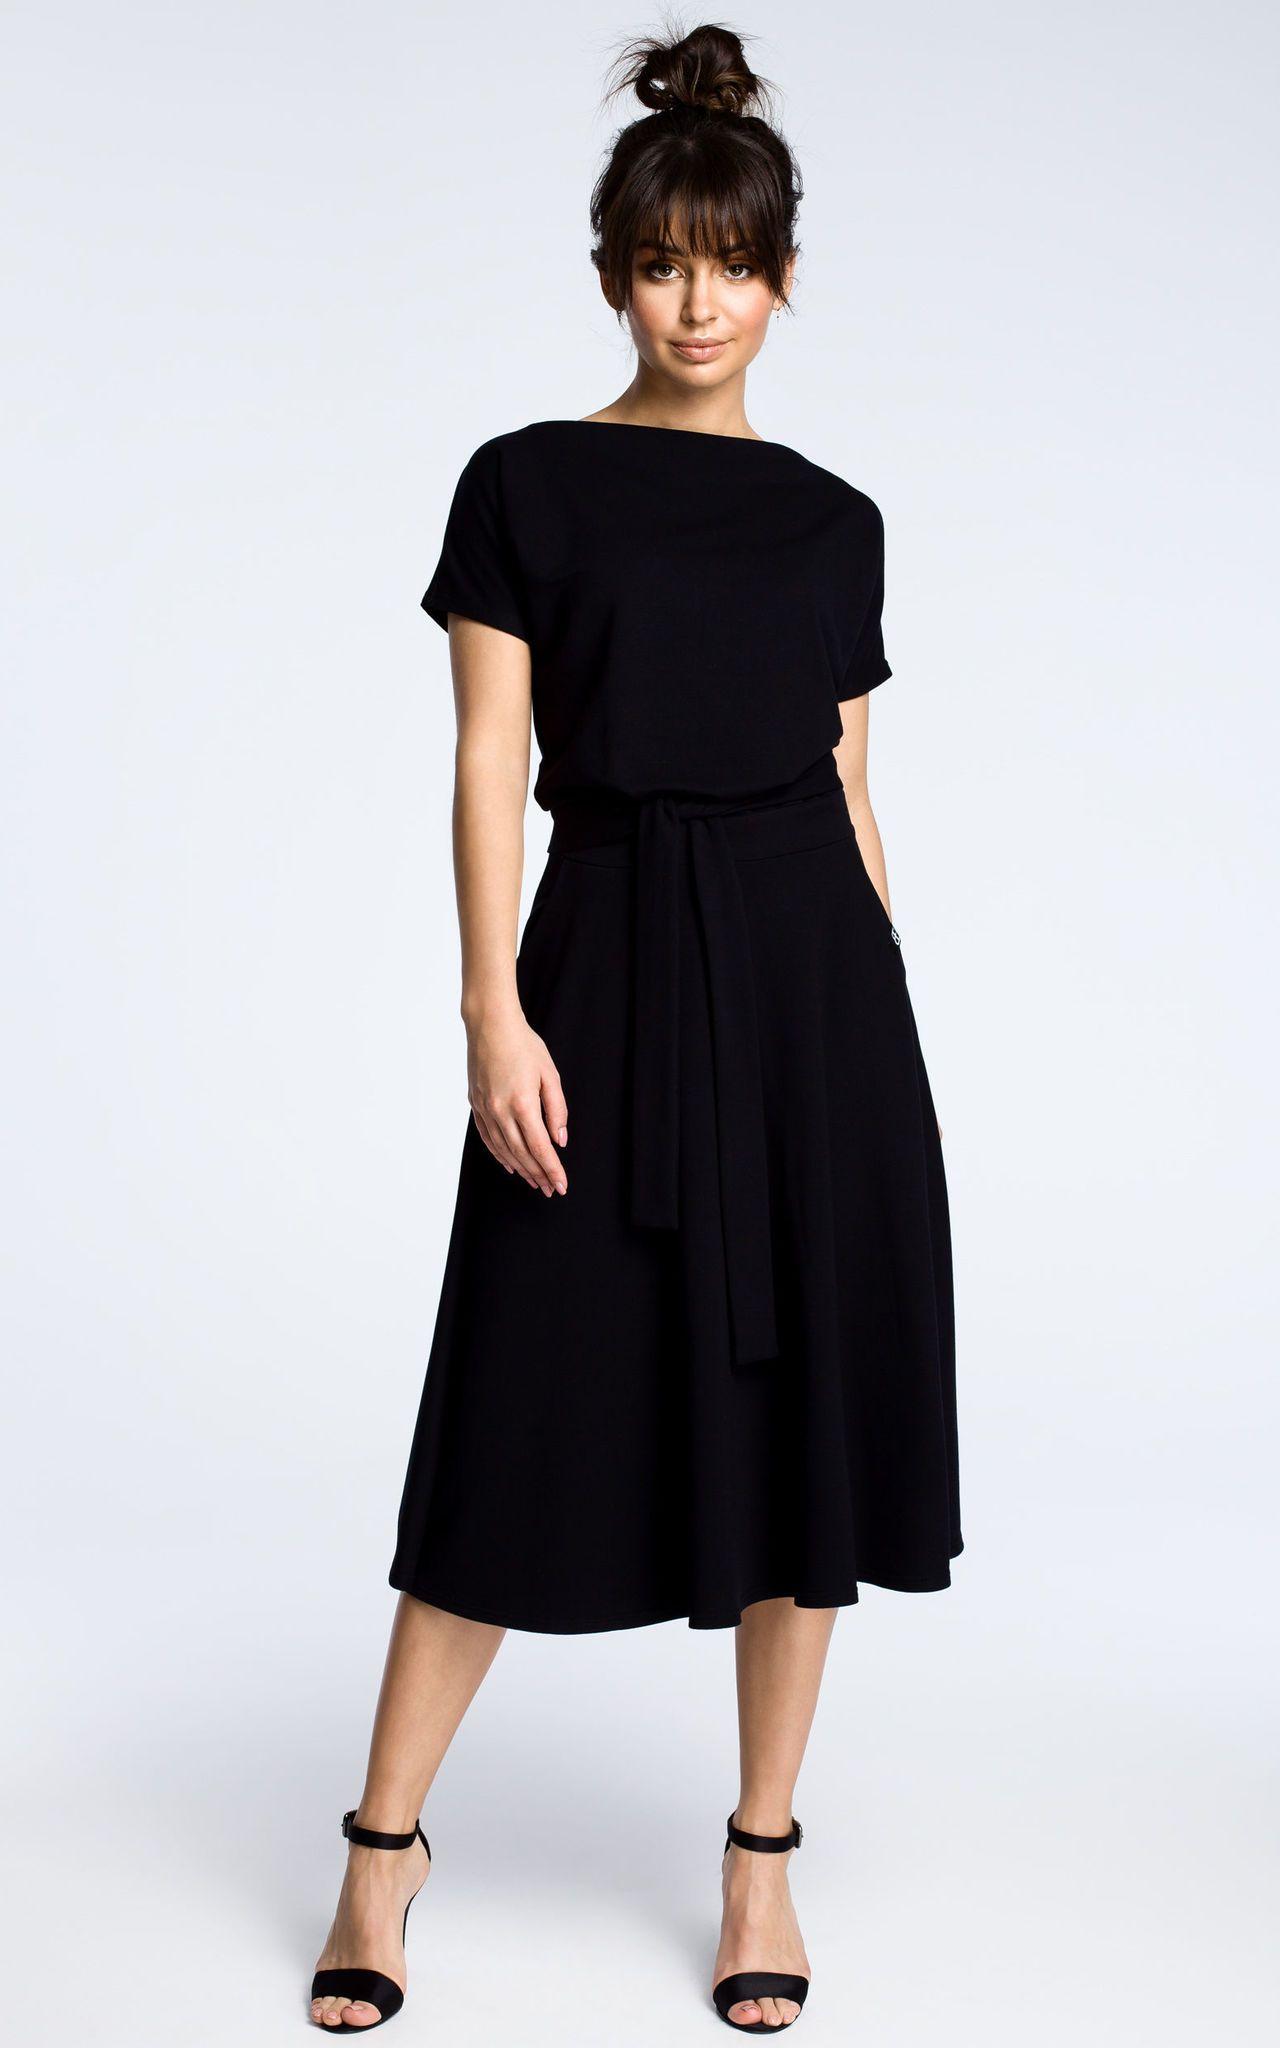 Black Midi Dress With Loose Fitting Top | MOE | SilkFred -   17 dress Simple midi ideas